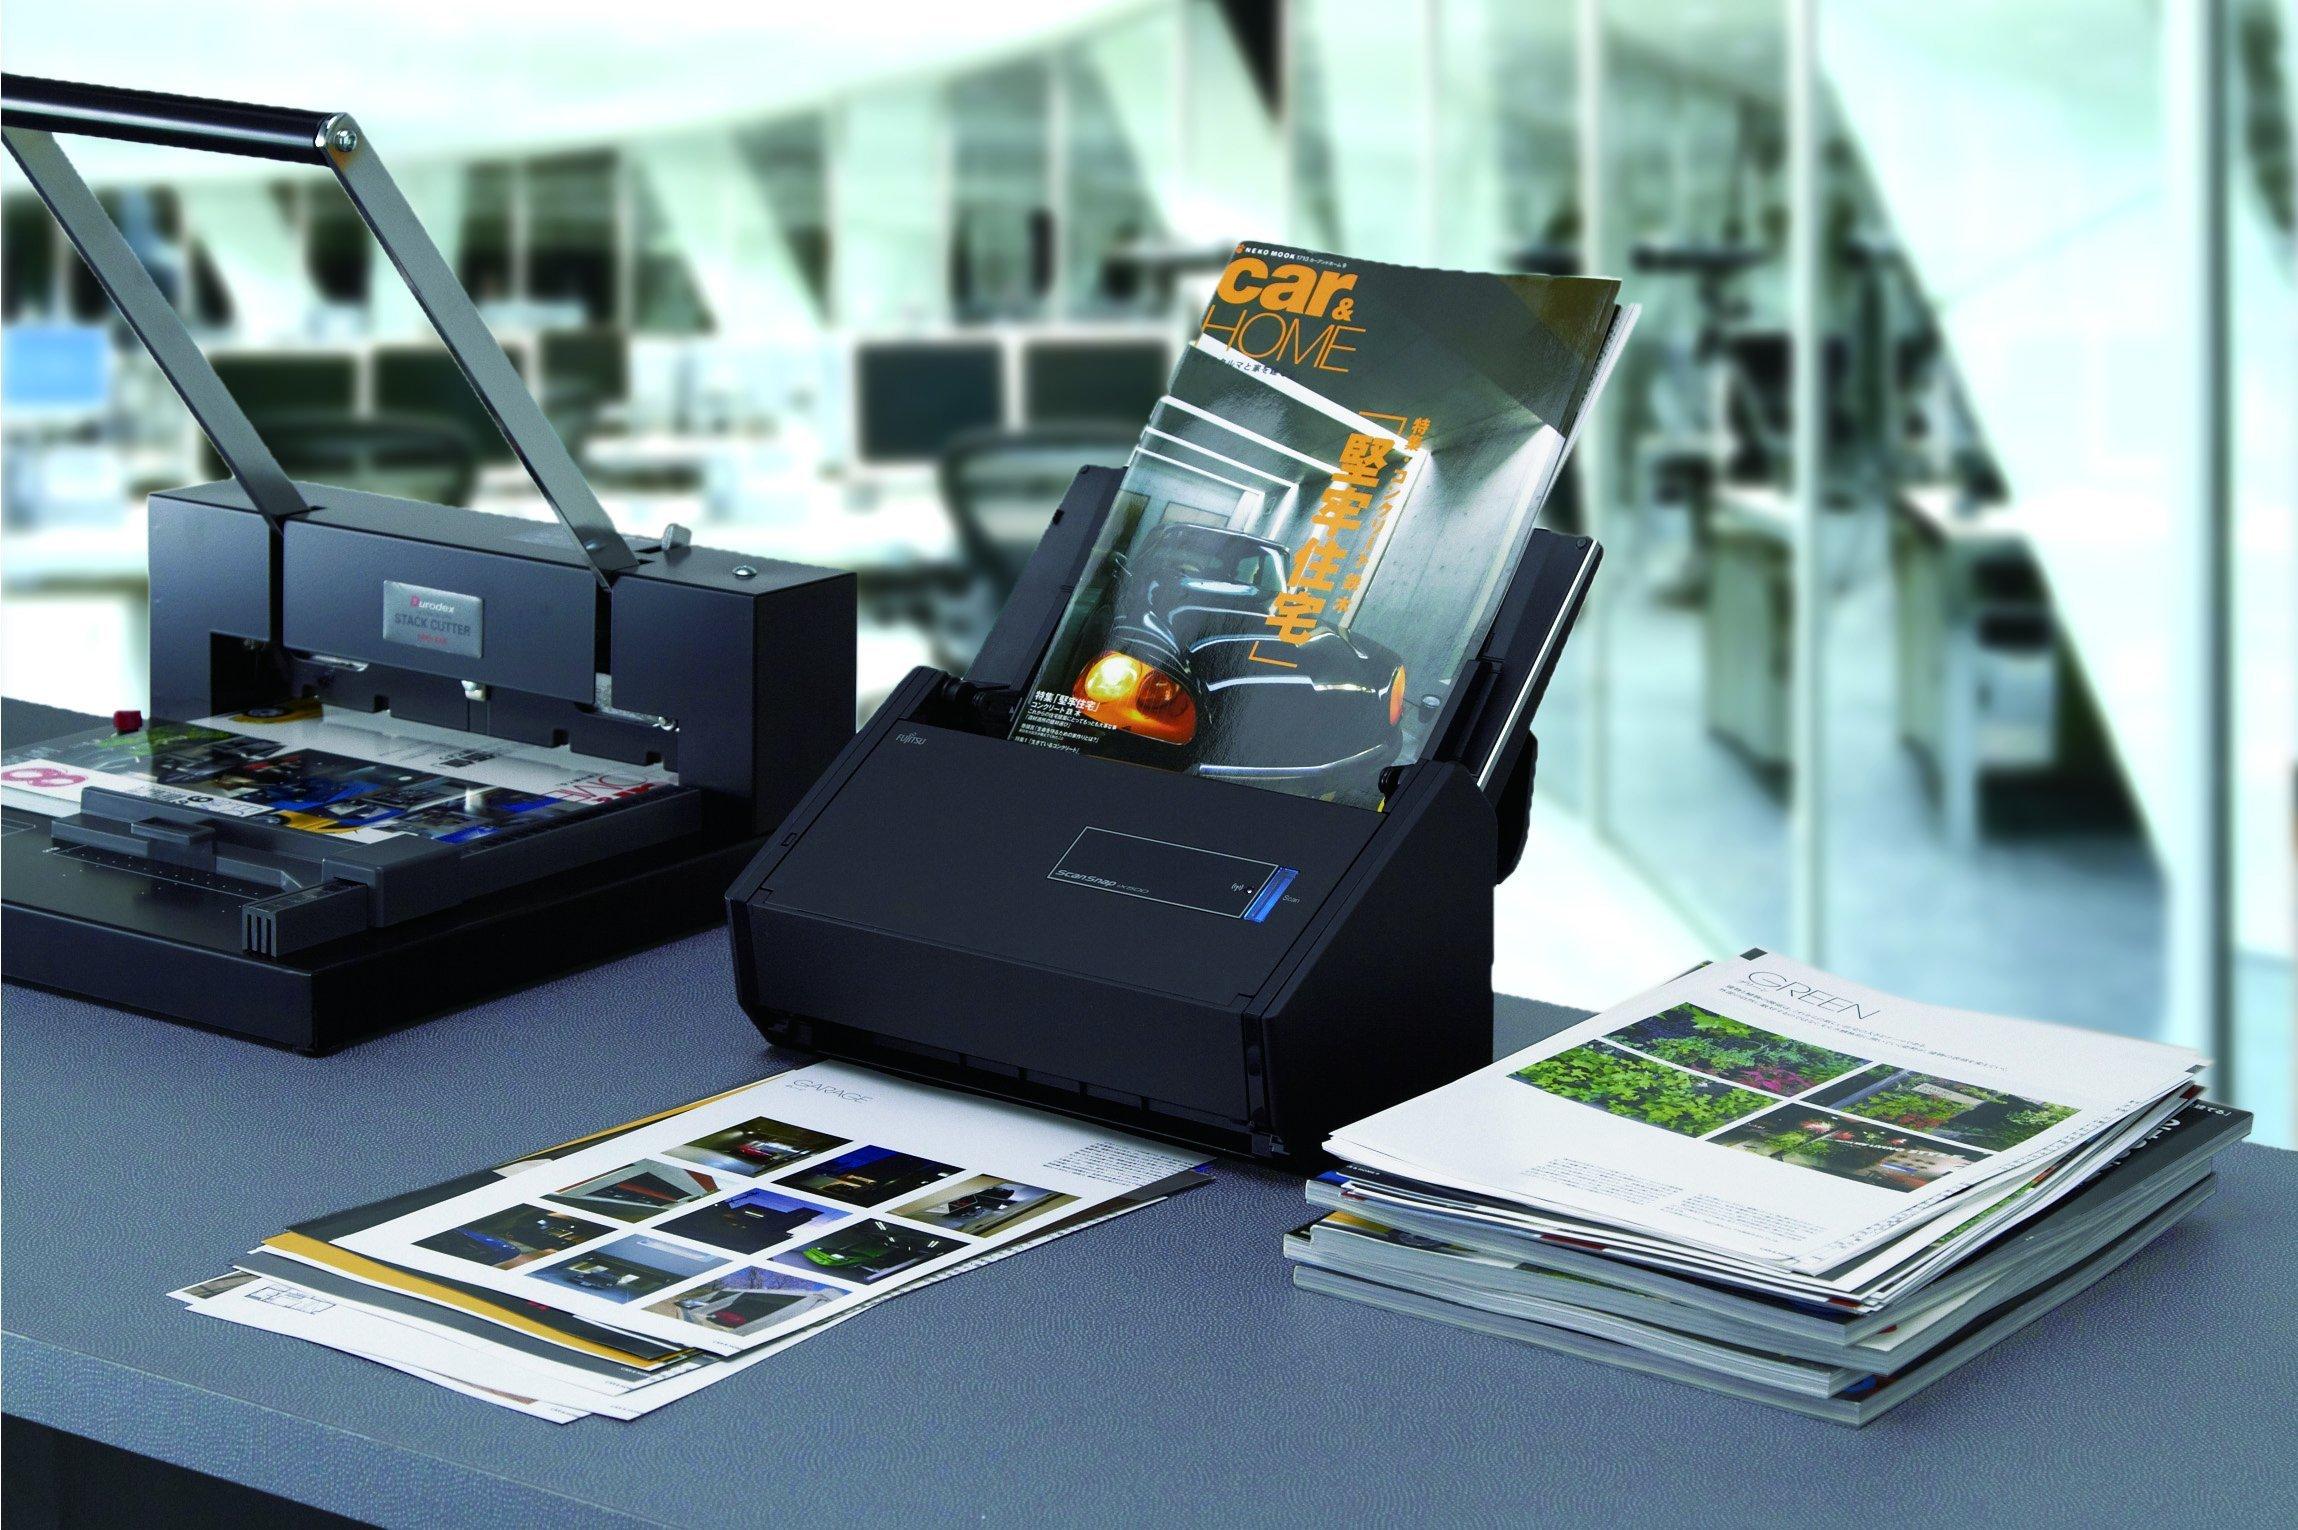 Fujitsu ScanSnap iX500 Color Duplex Desk Scanner for Mac and PC (Renewed) by Fujitsu (Image #5)